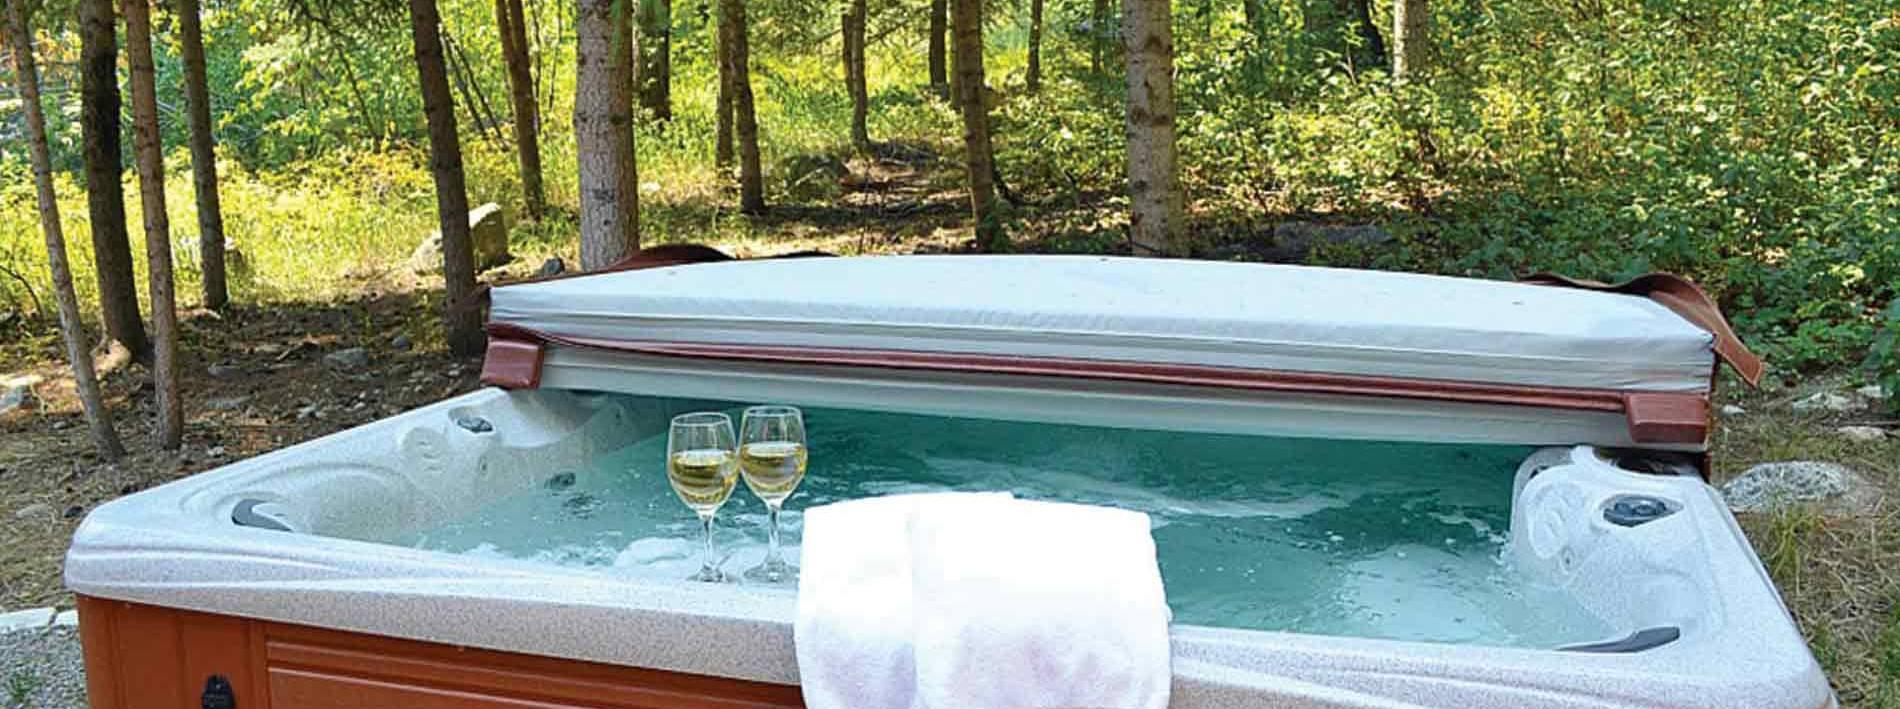 6 Bedroom Cabin Jackson Hole Vacation Rentals Sleeps